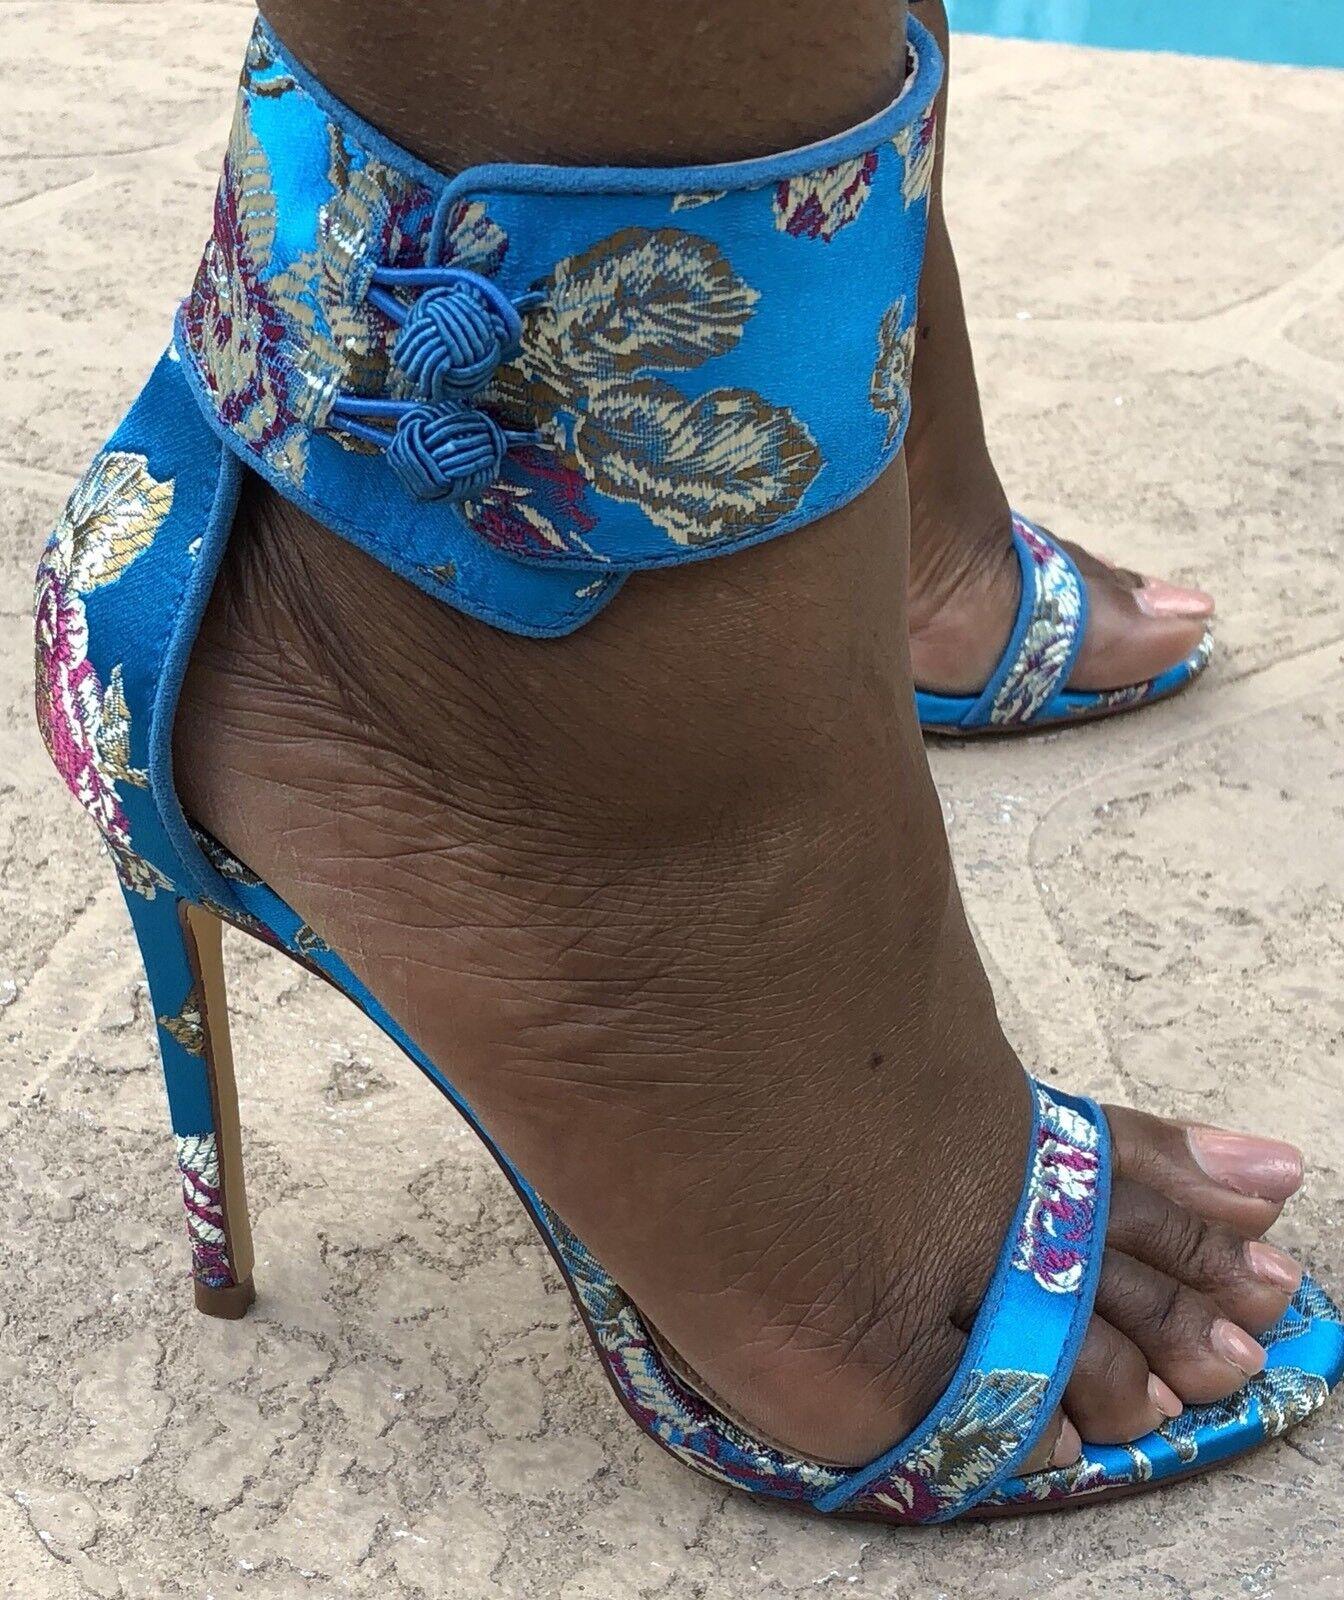 liliana shoes Blue Floral Heels Size 9